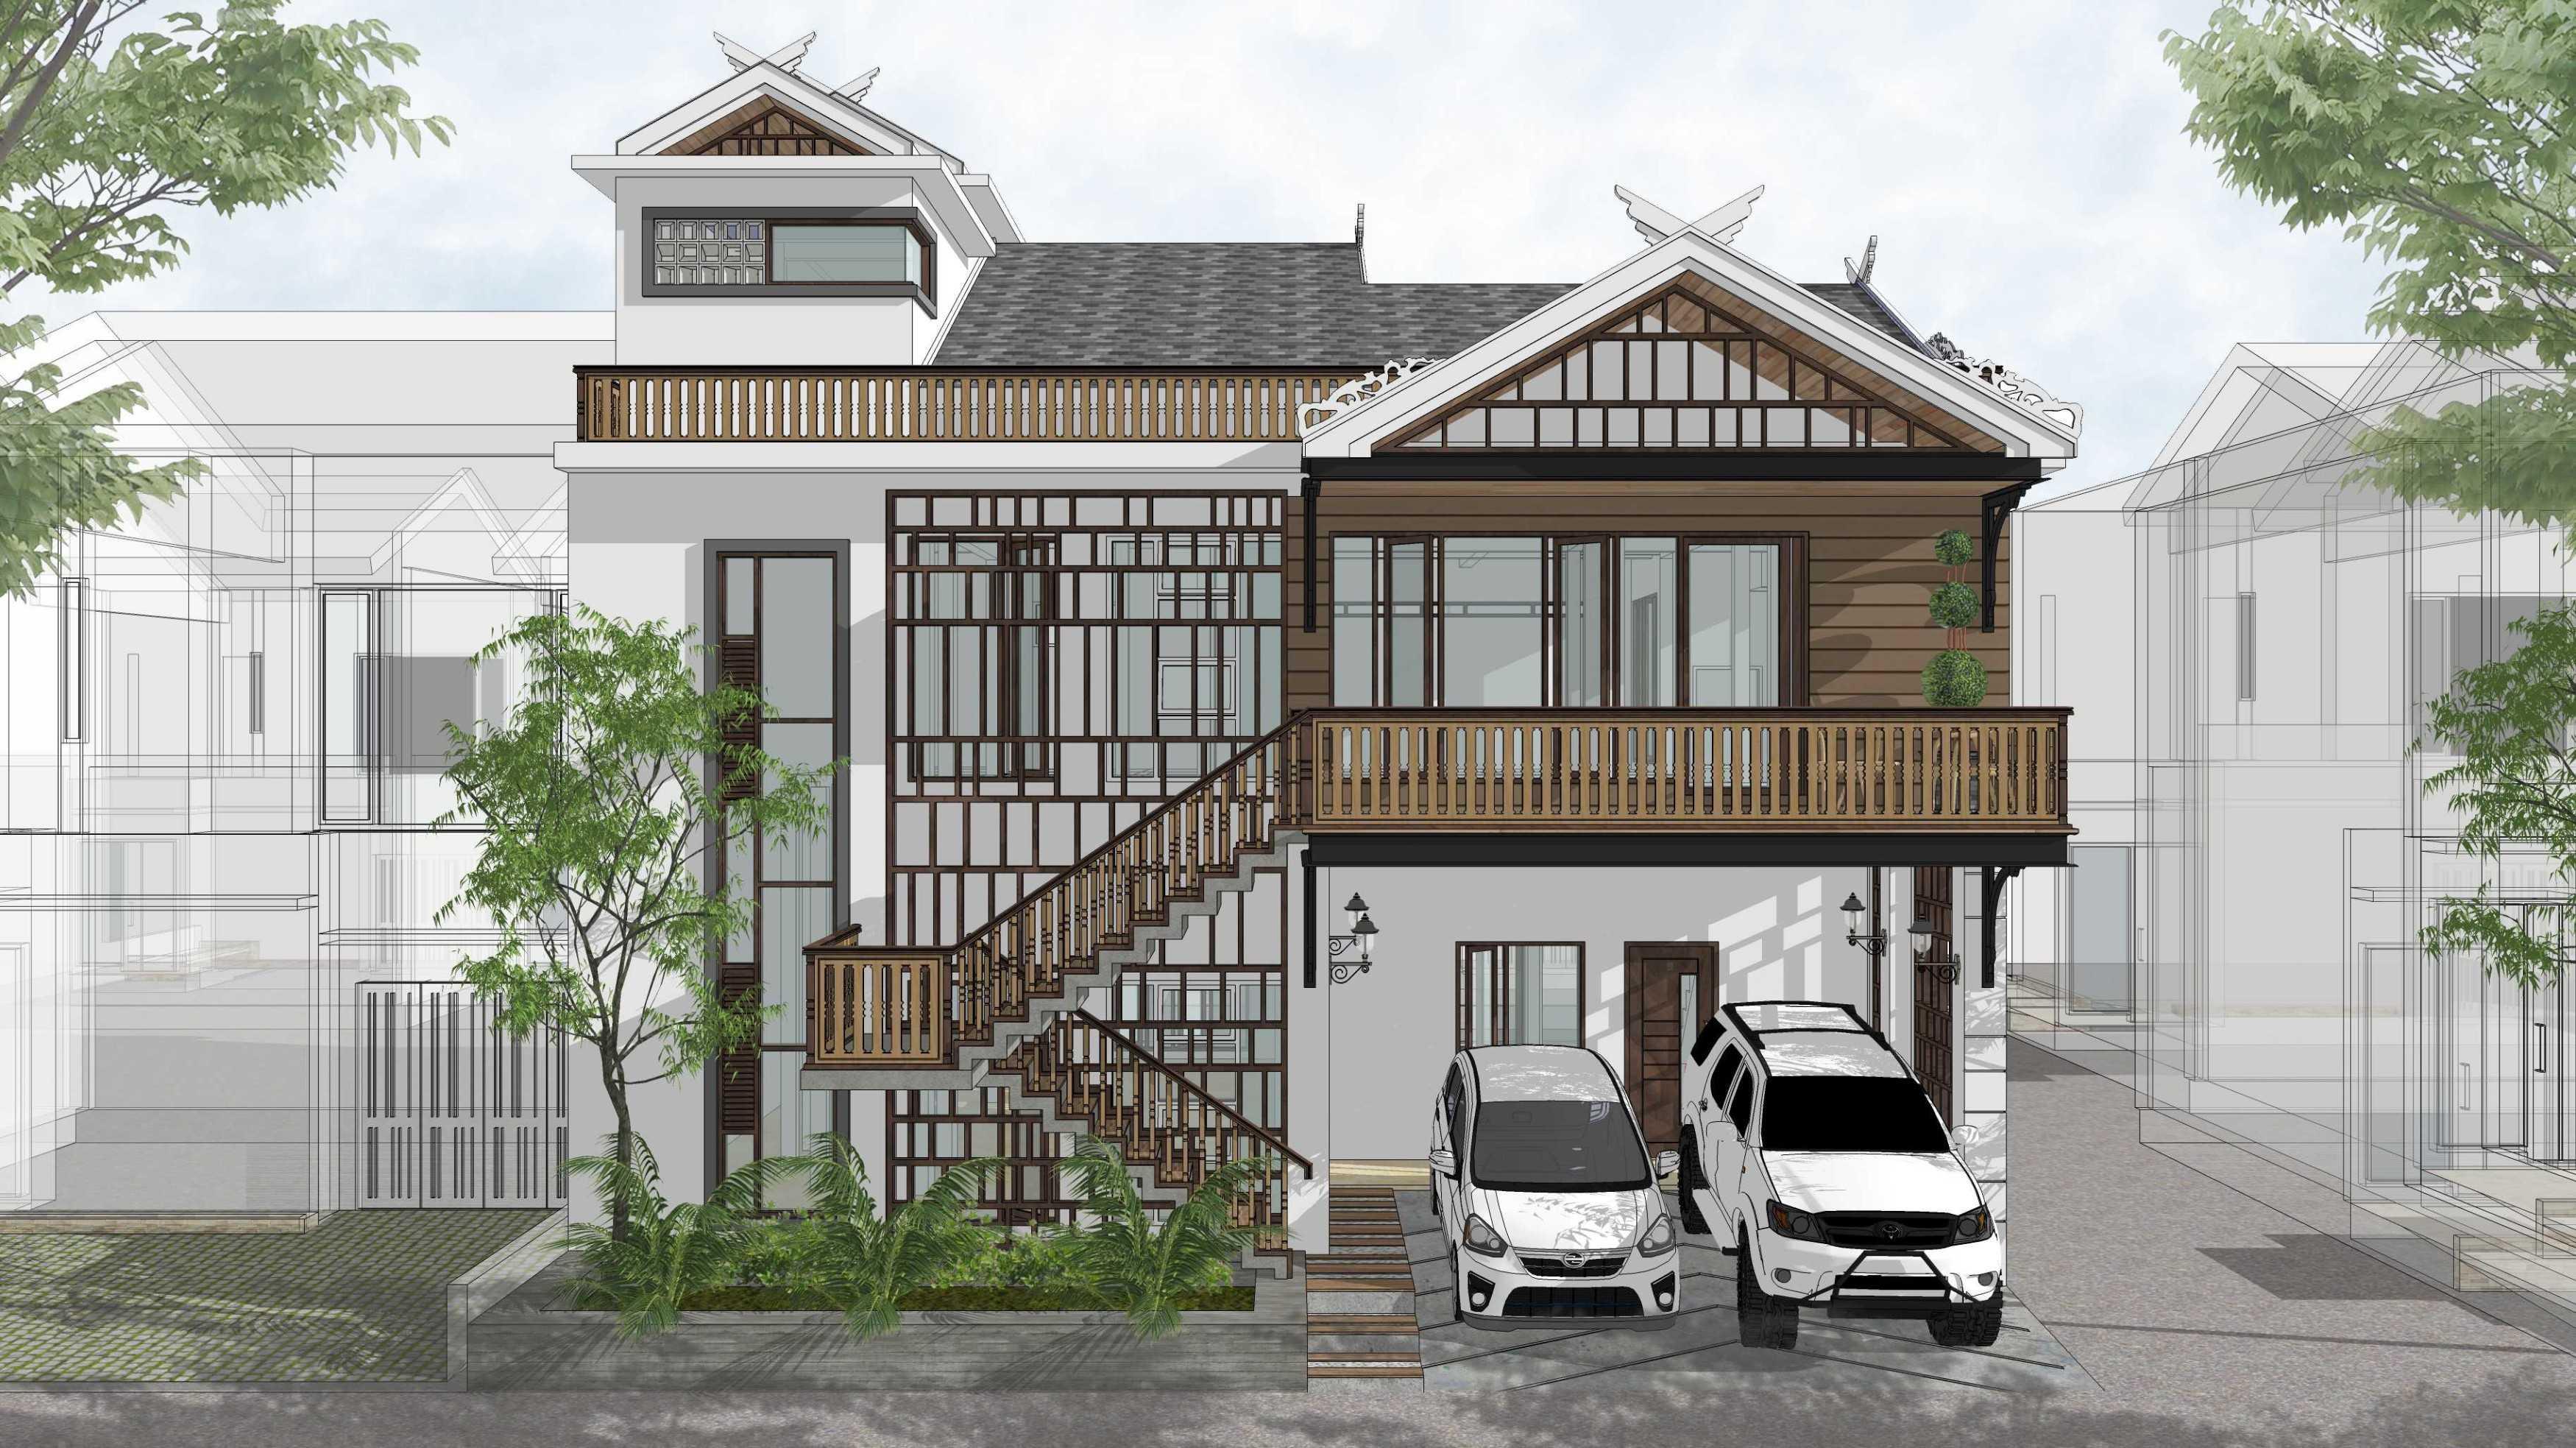 Miv Architects (Ar. Muhammad Ikhsan Hamiru, Iai & Partners) Baruga Kayu Putih Bukit Baruga Residence, Makassar, Indonesia Bukit Baruga Residence, Makassar, Indonesia B Tradisional,modern,wood  29295